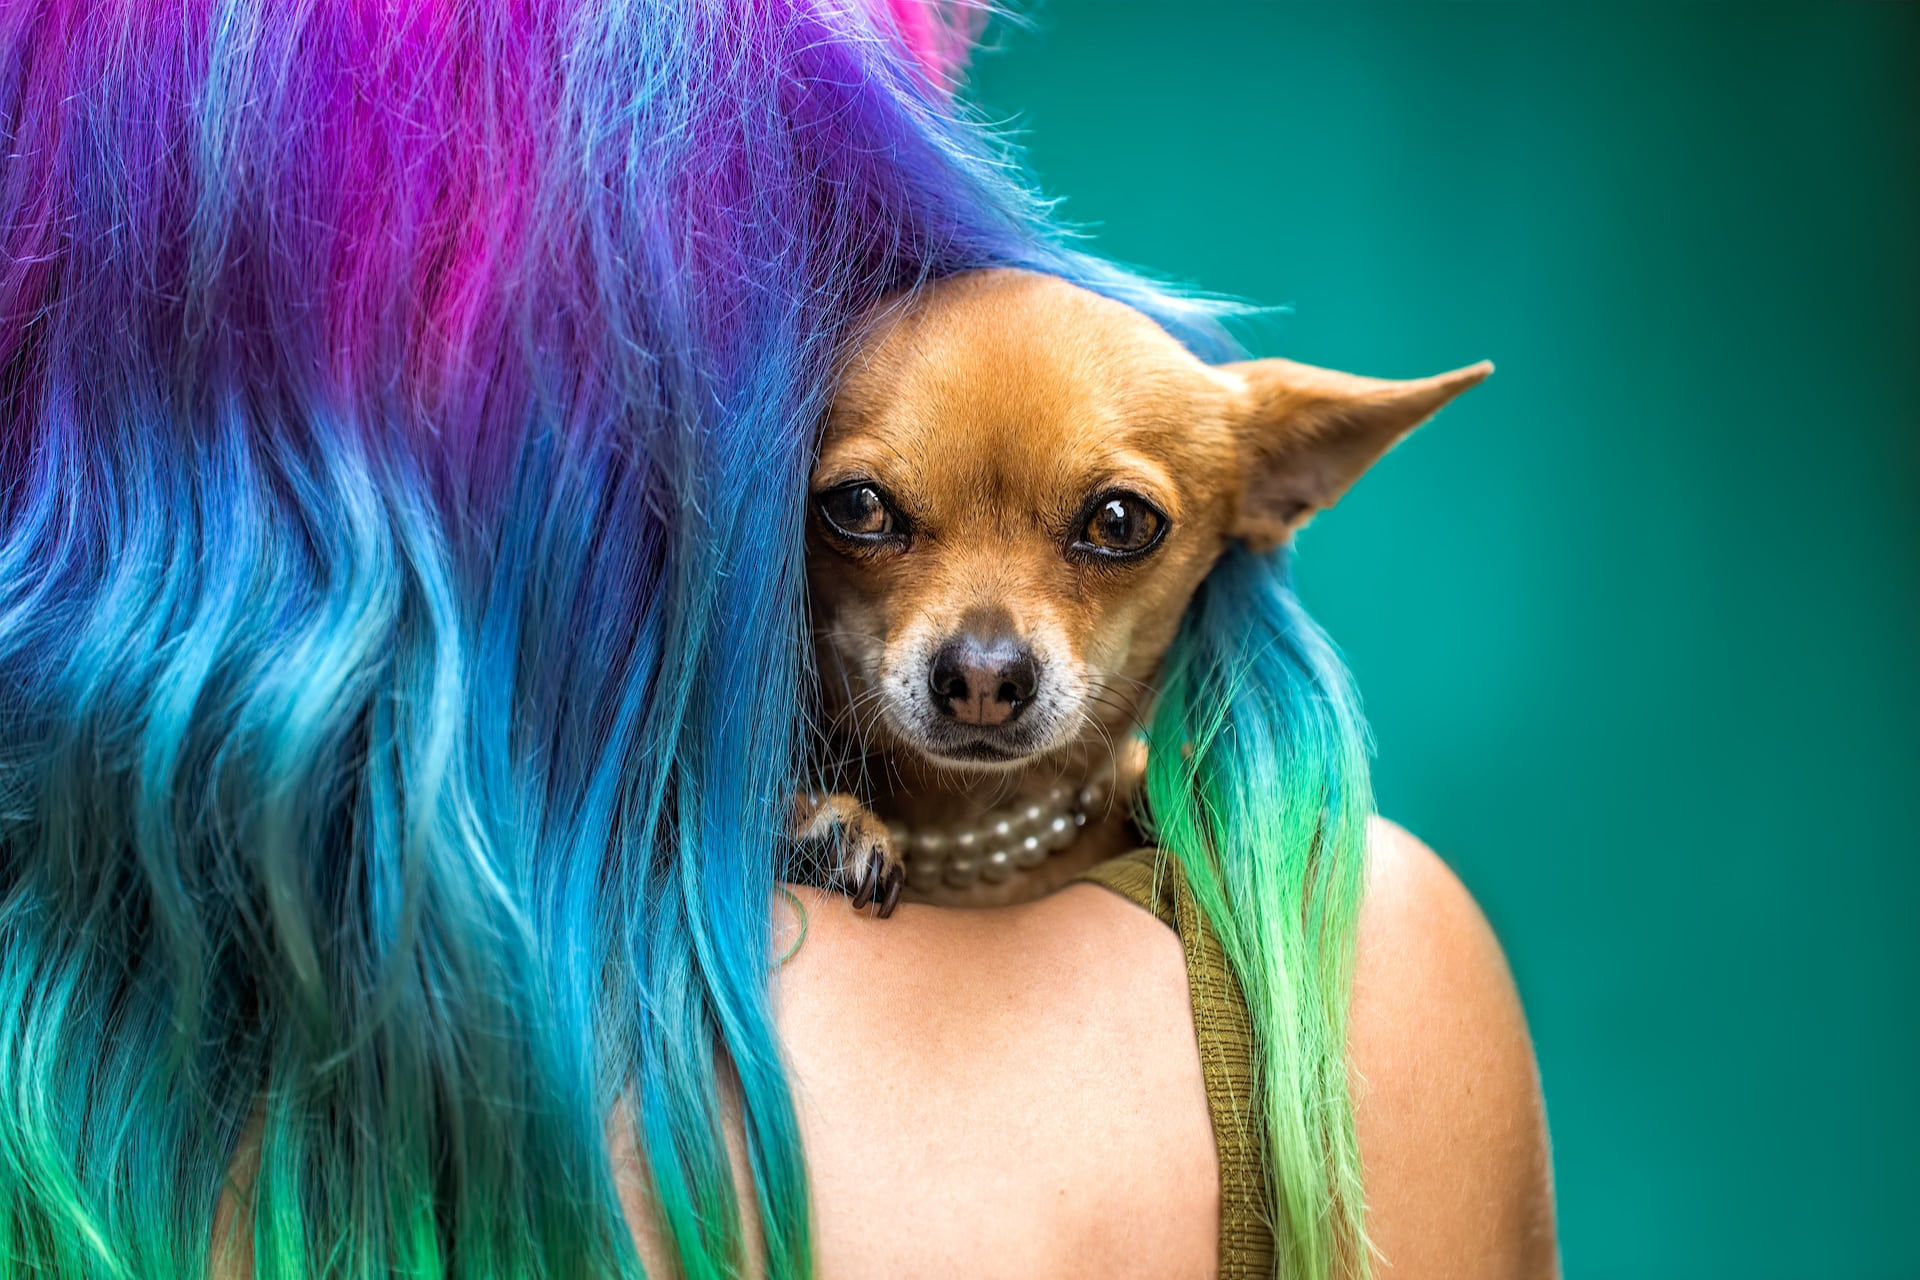 Chihuahua France Colorful Hair